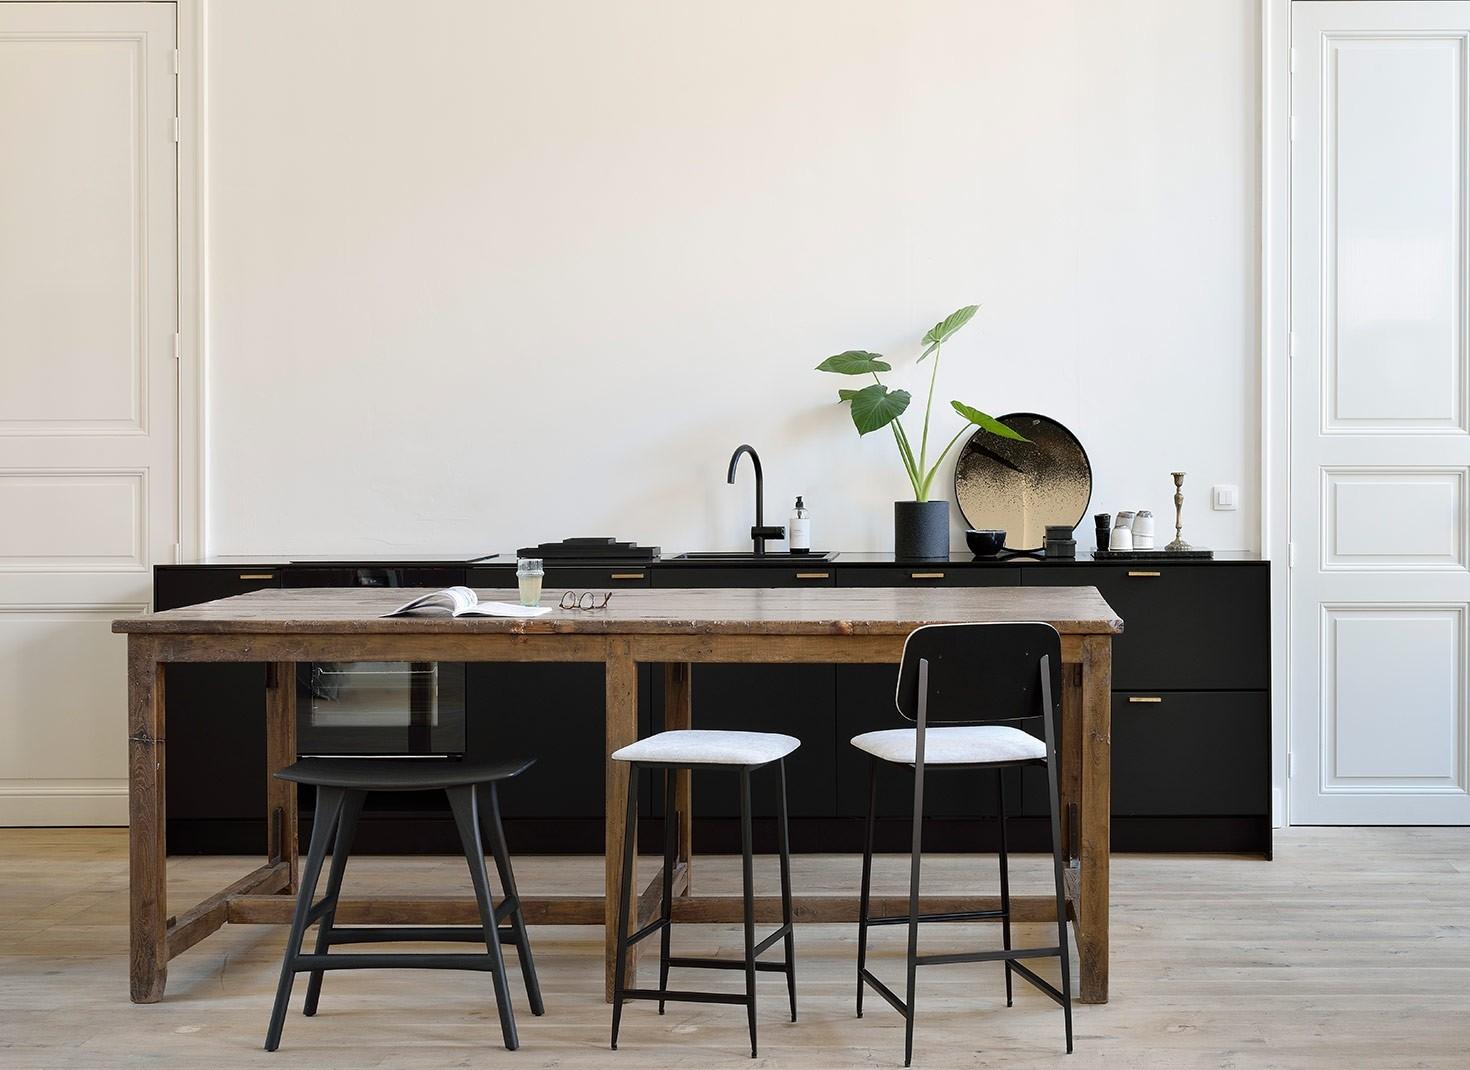 Ethnicraft DC Bar Stool Without Backrest – Light Grey